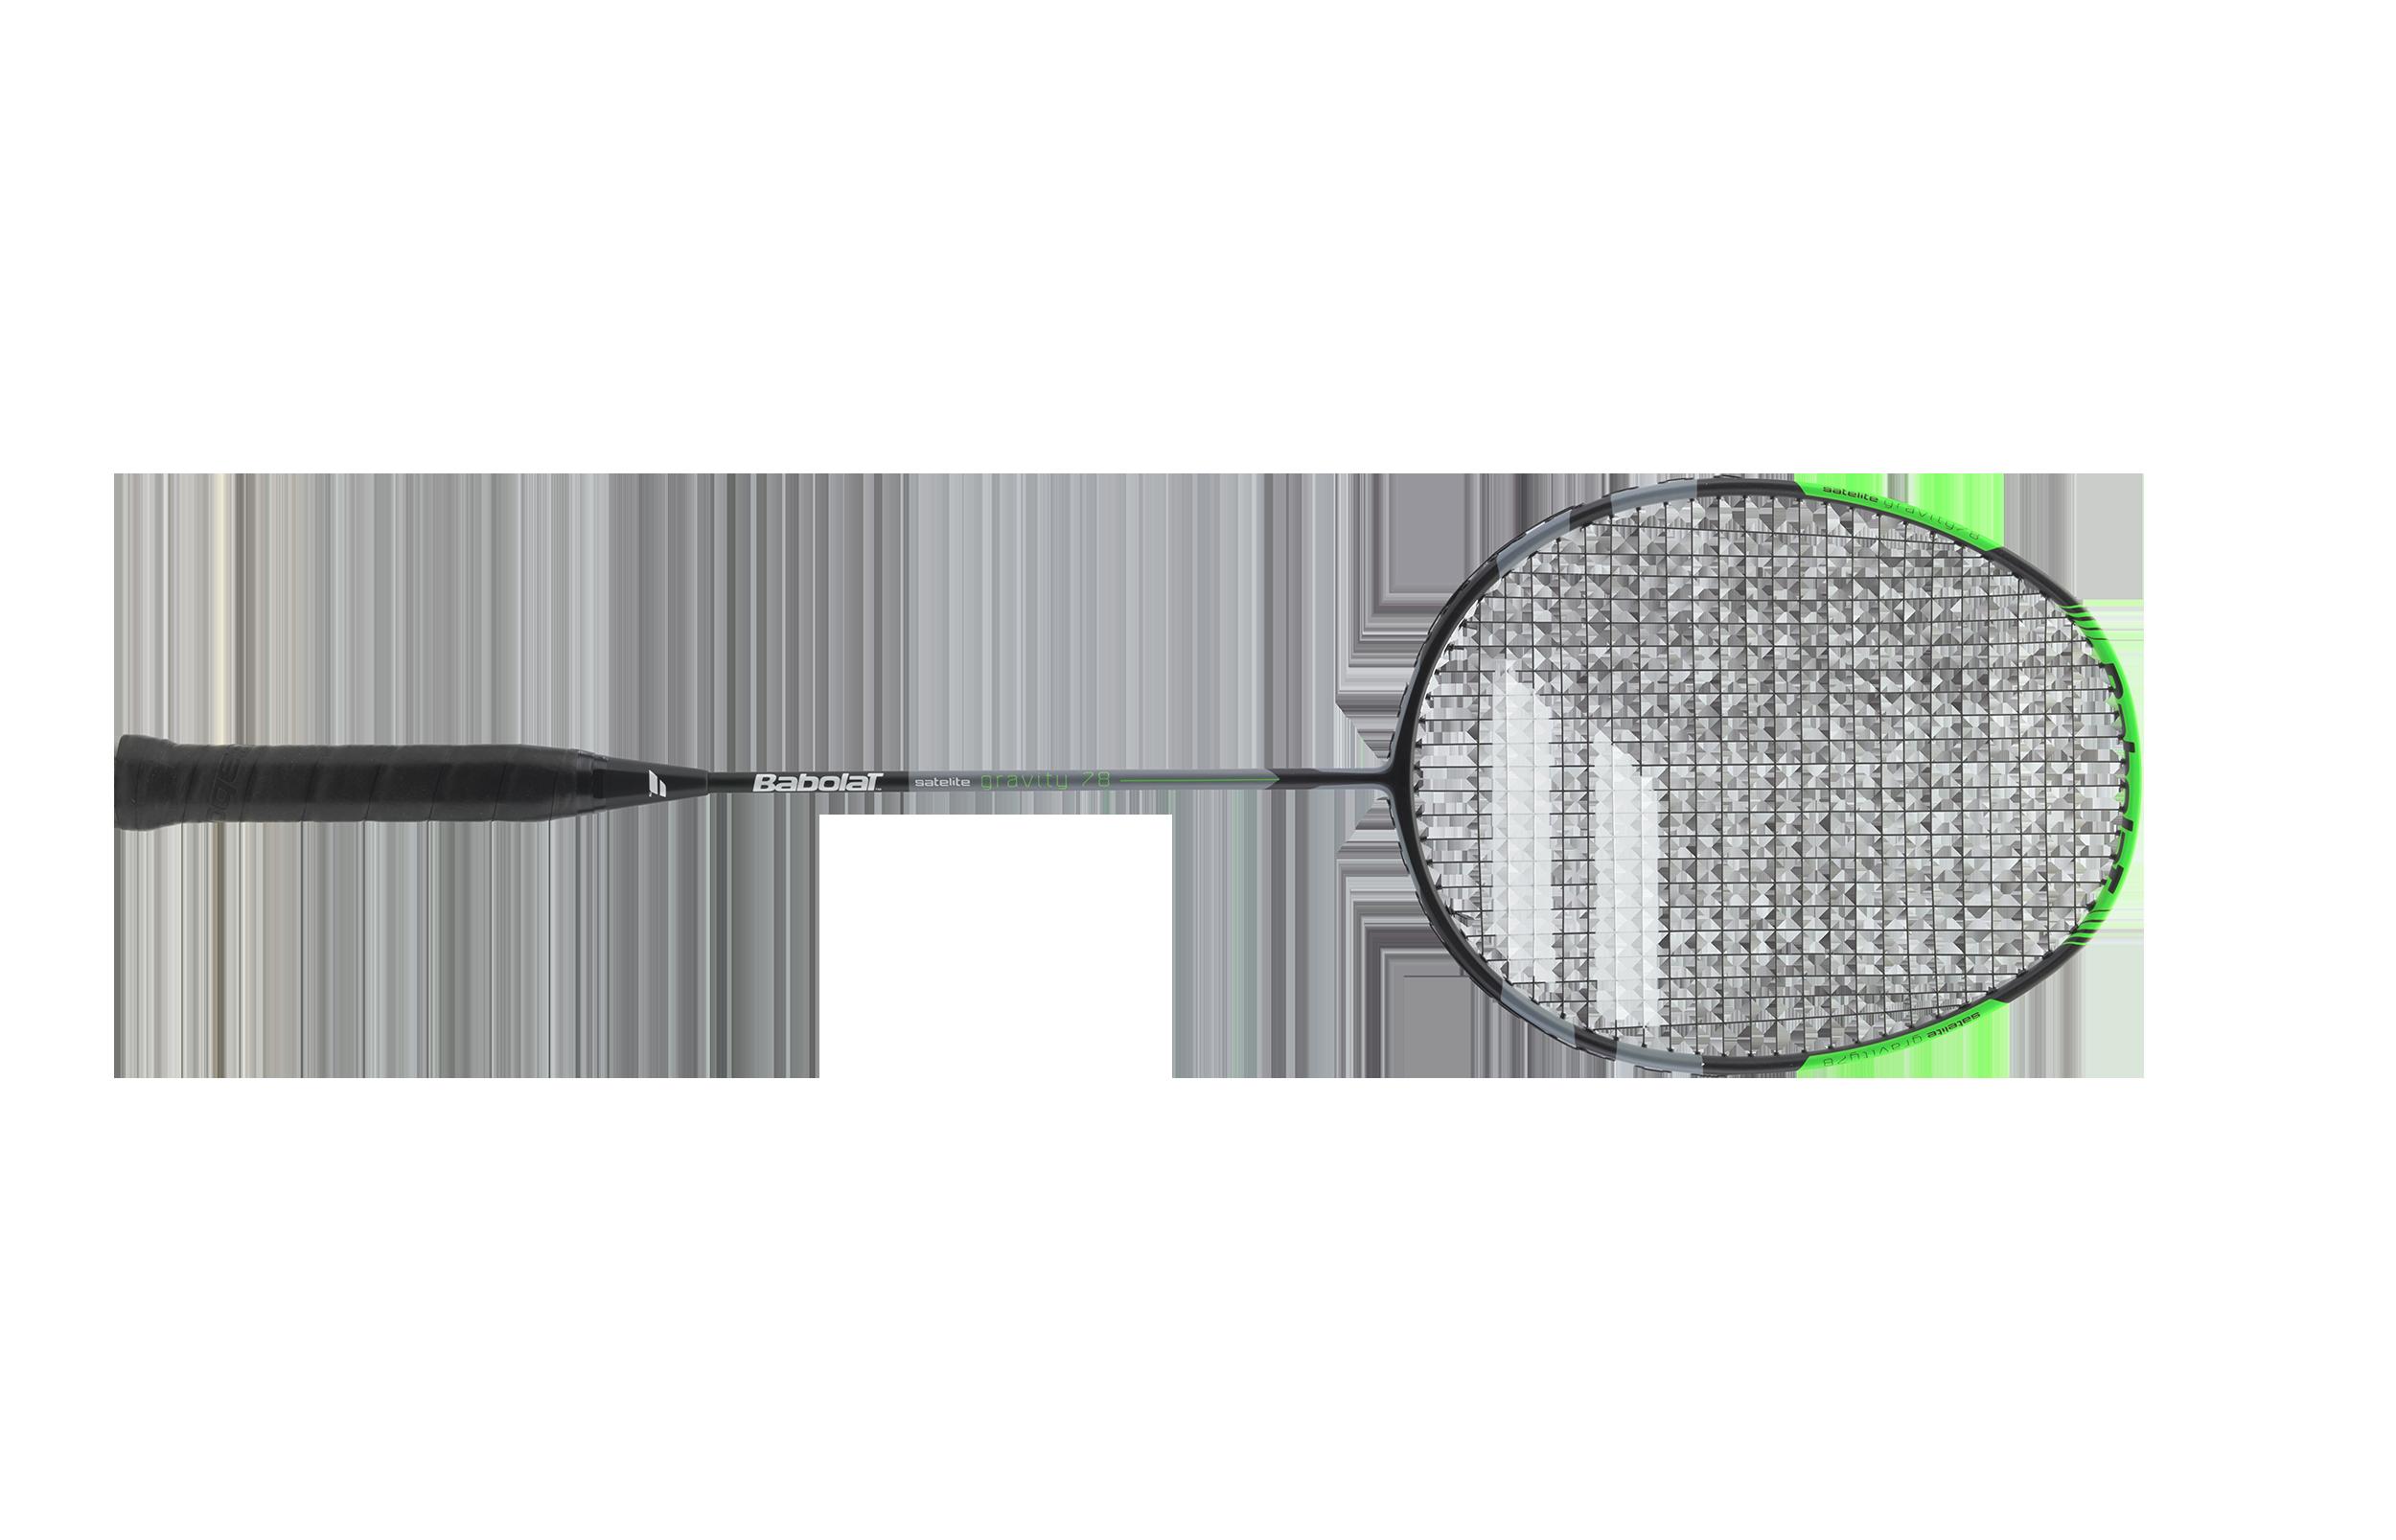 Badminton Racket Png Image Badminton Racket Rackets Yonex Badminton Racket